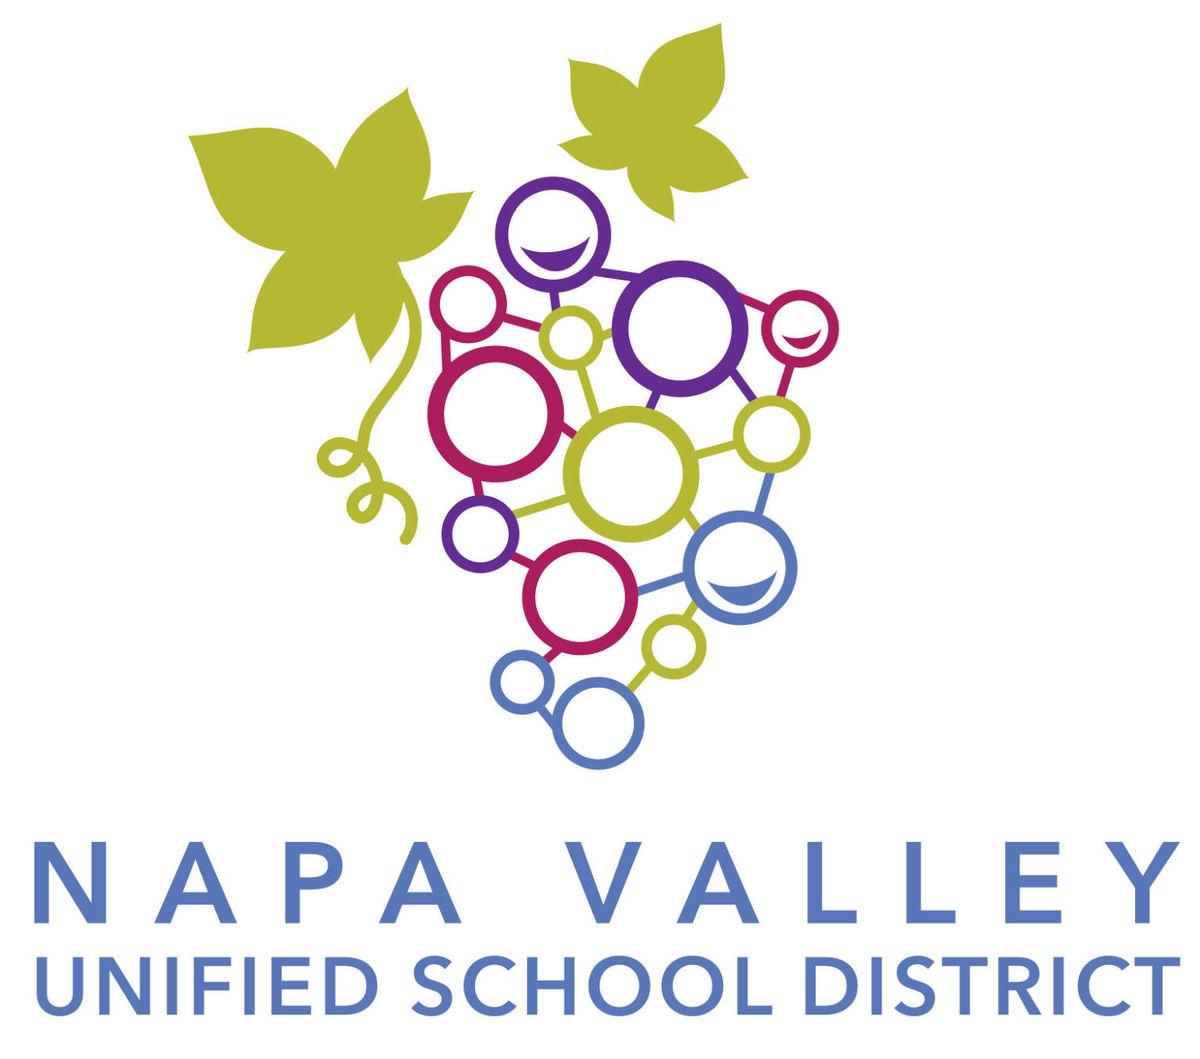 Napa Valley Unified School District.jpg